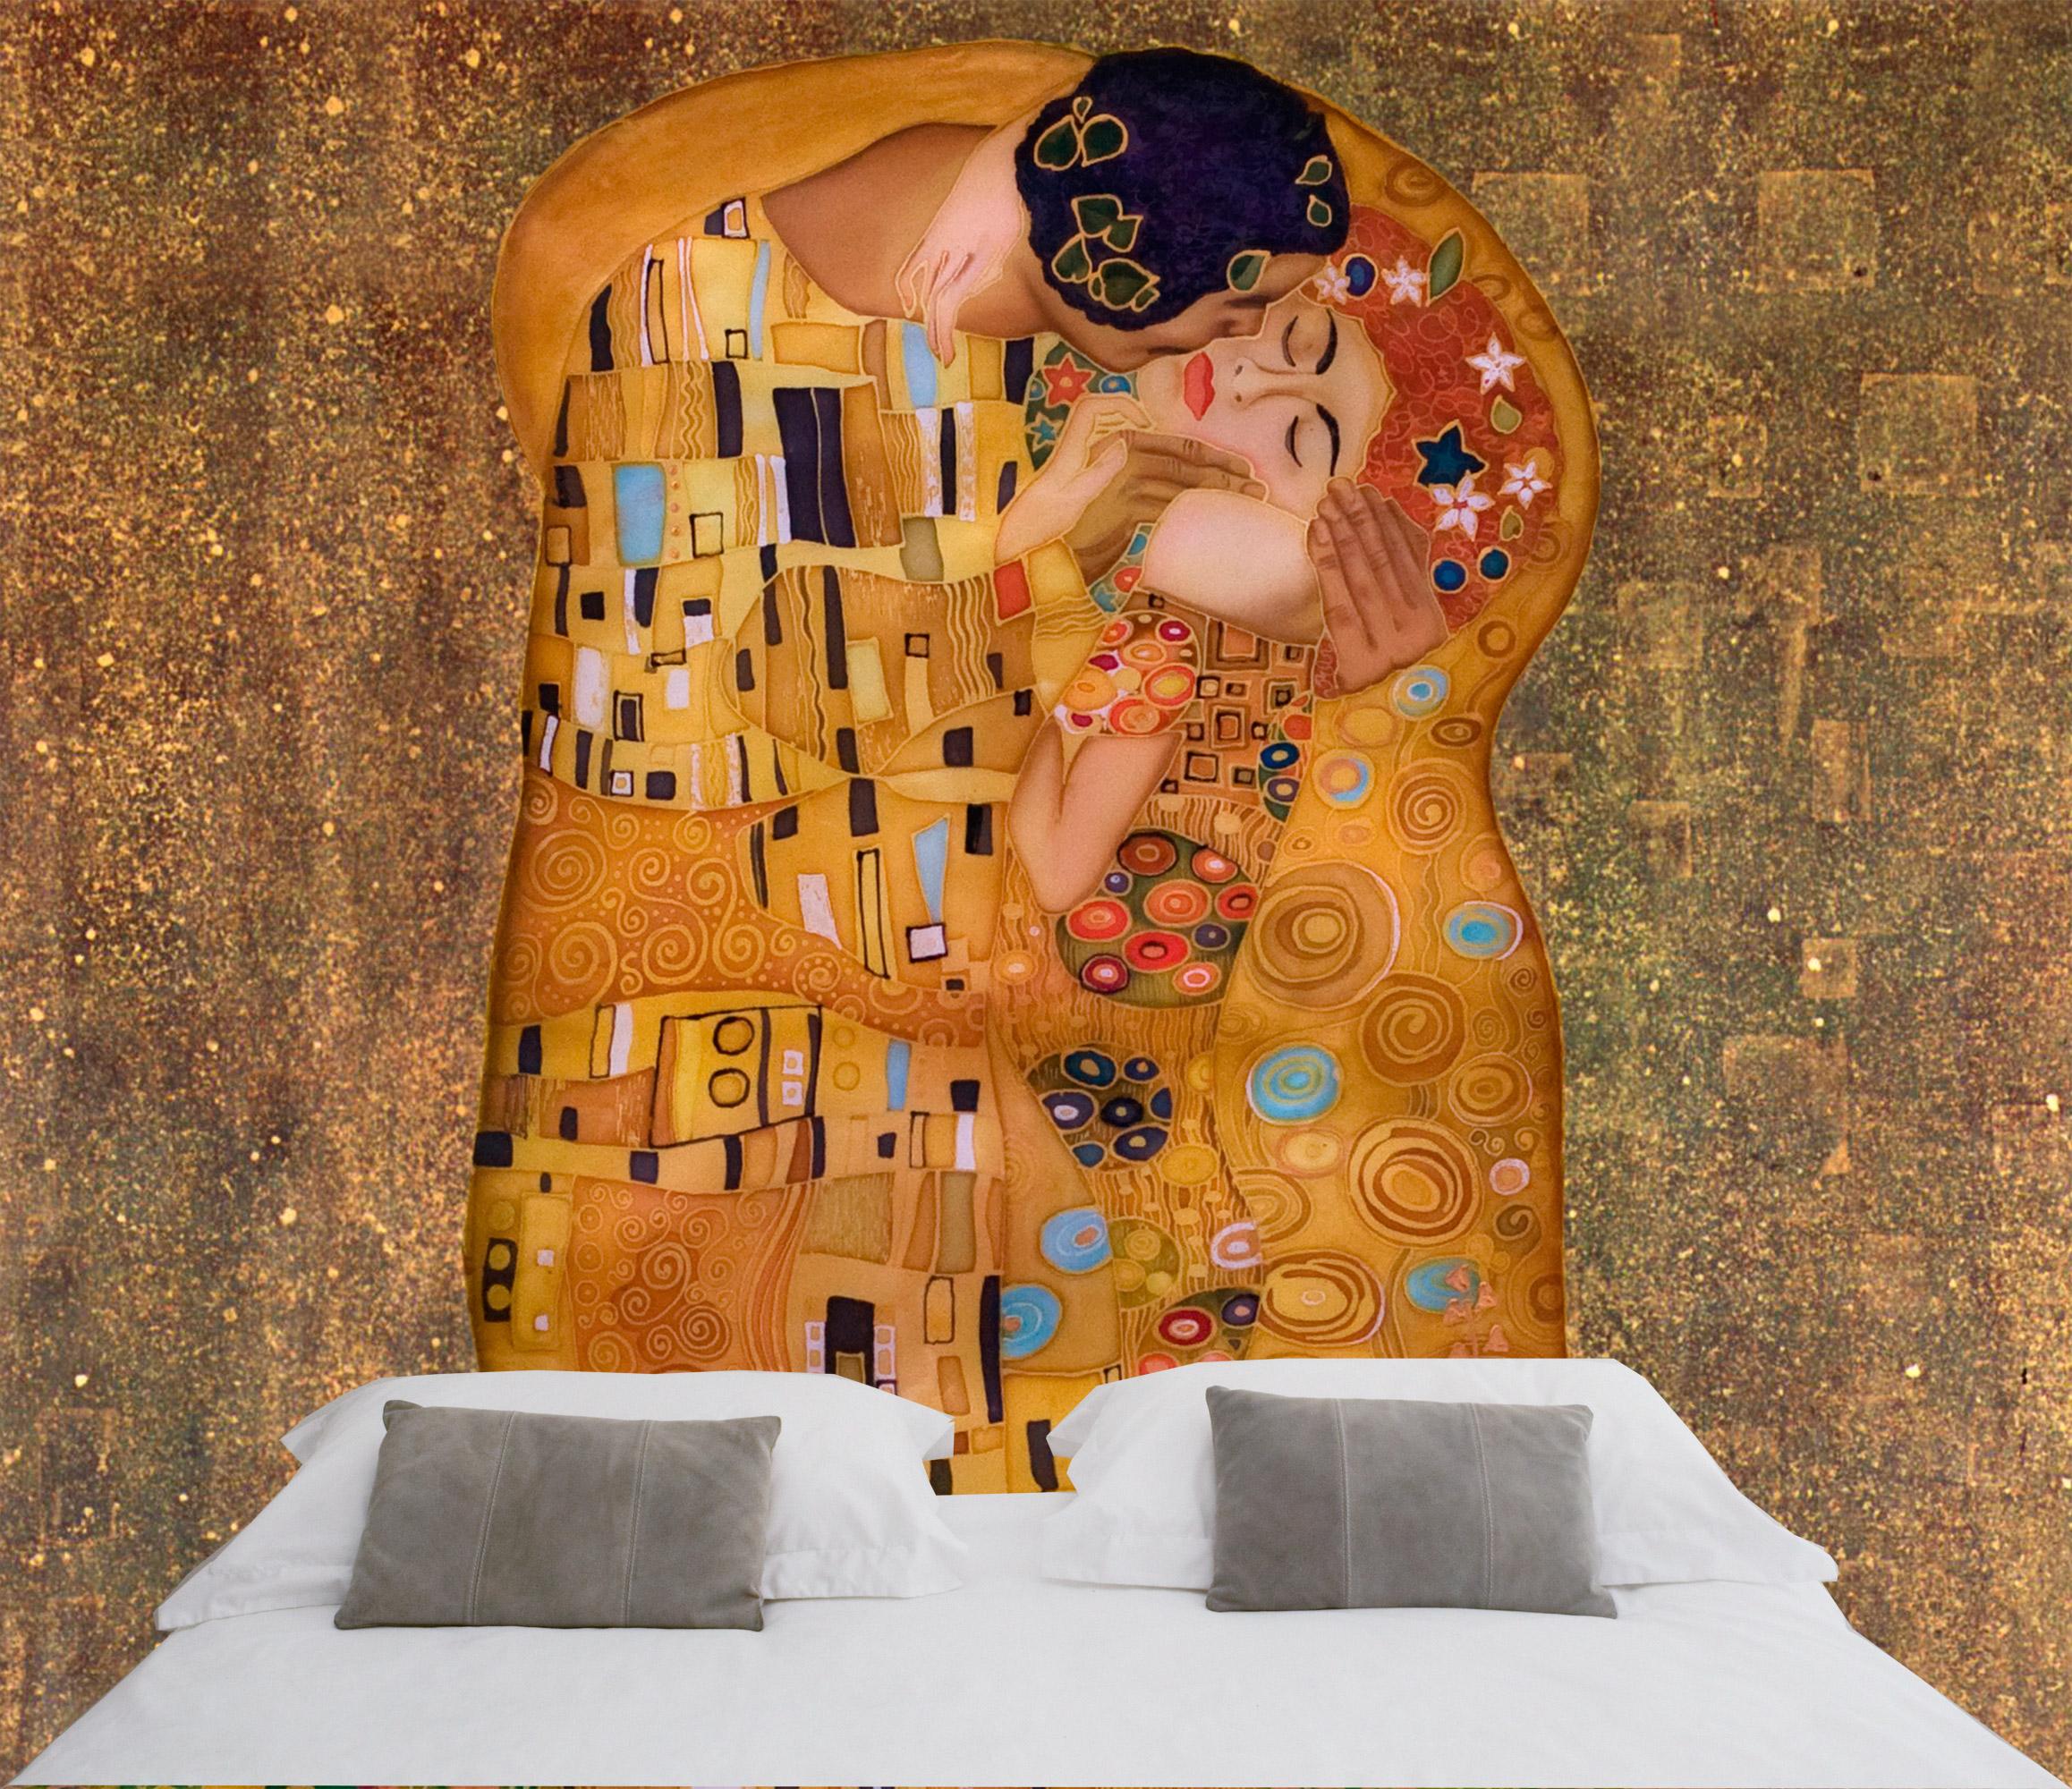 Buy Wall Stickers Online The Kiss 180 180 By Gustav Klimt